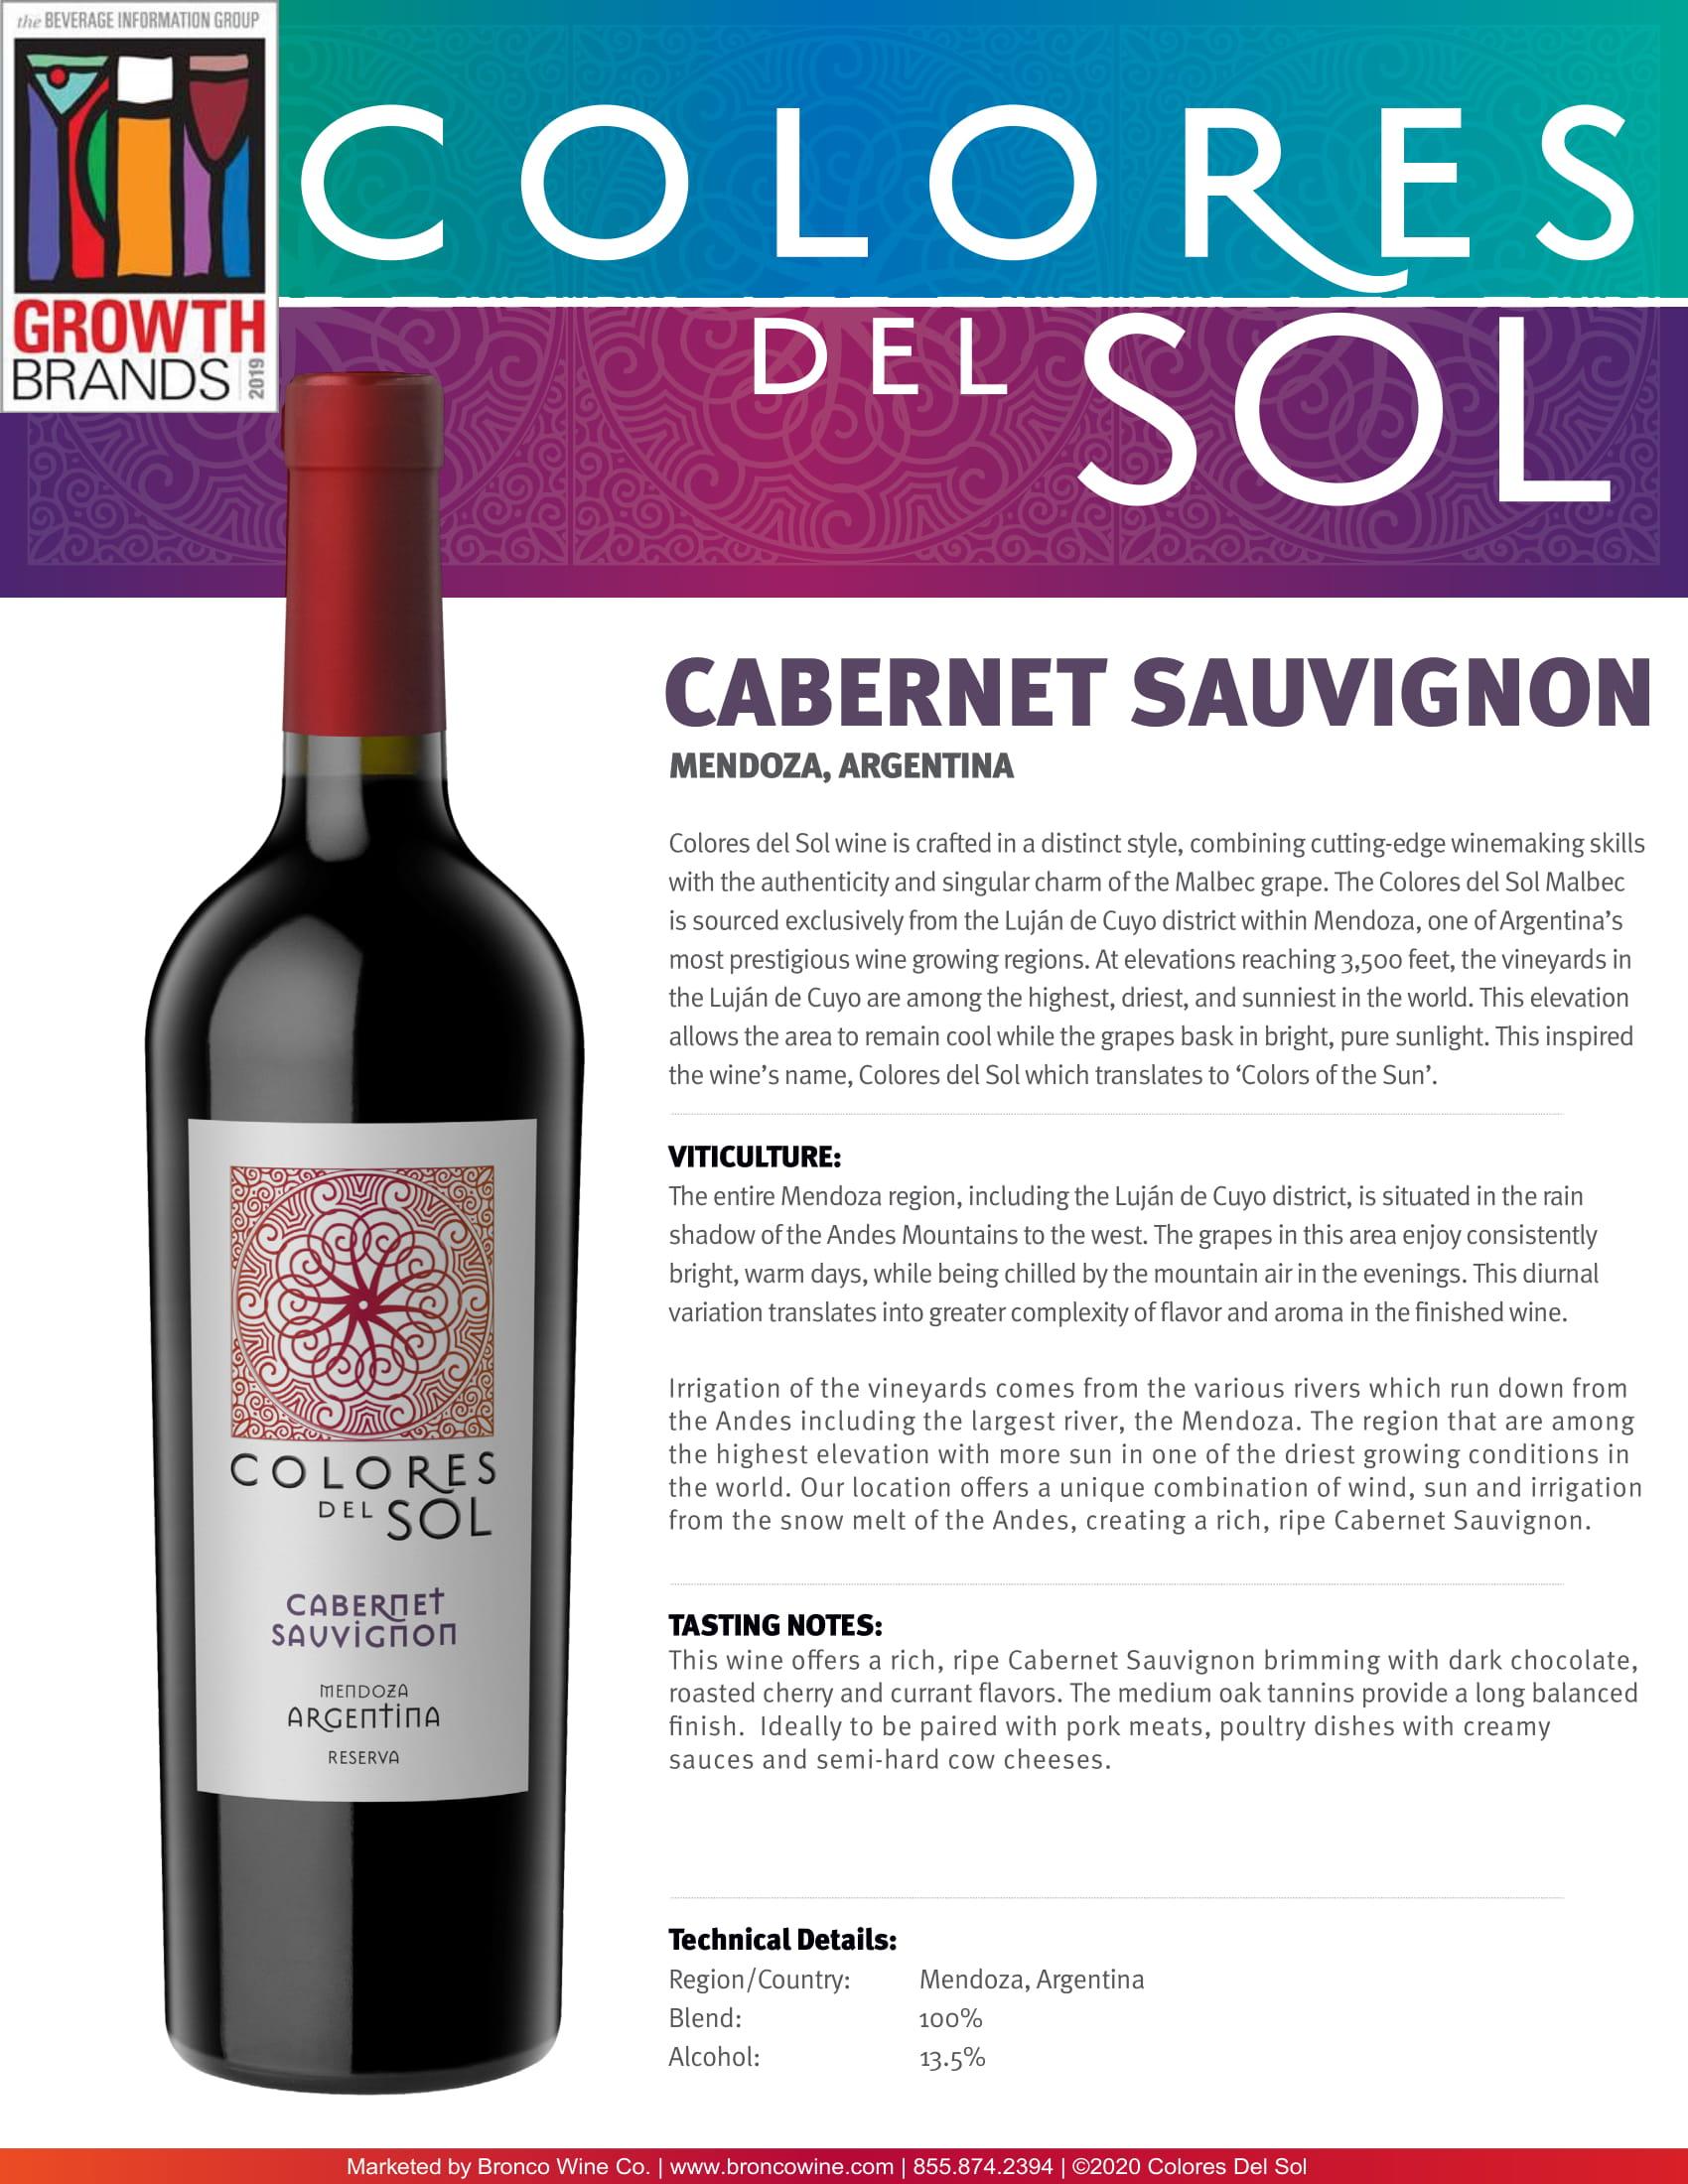 Colores Del Sol Cabernet Sauvignon Tech Sheet